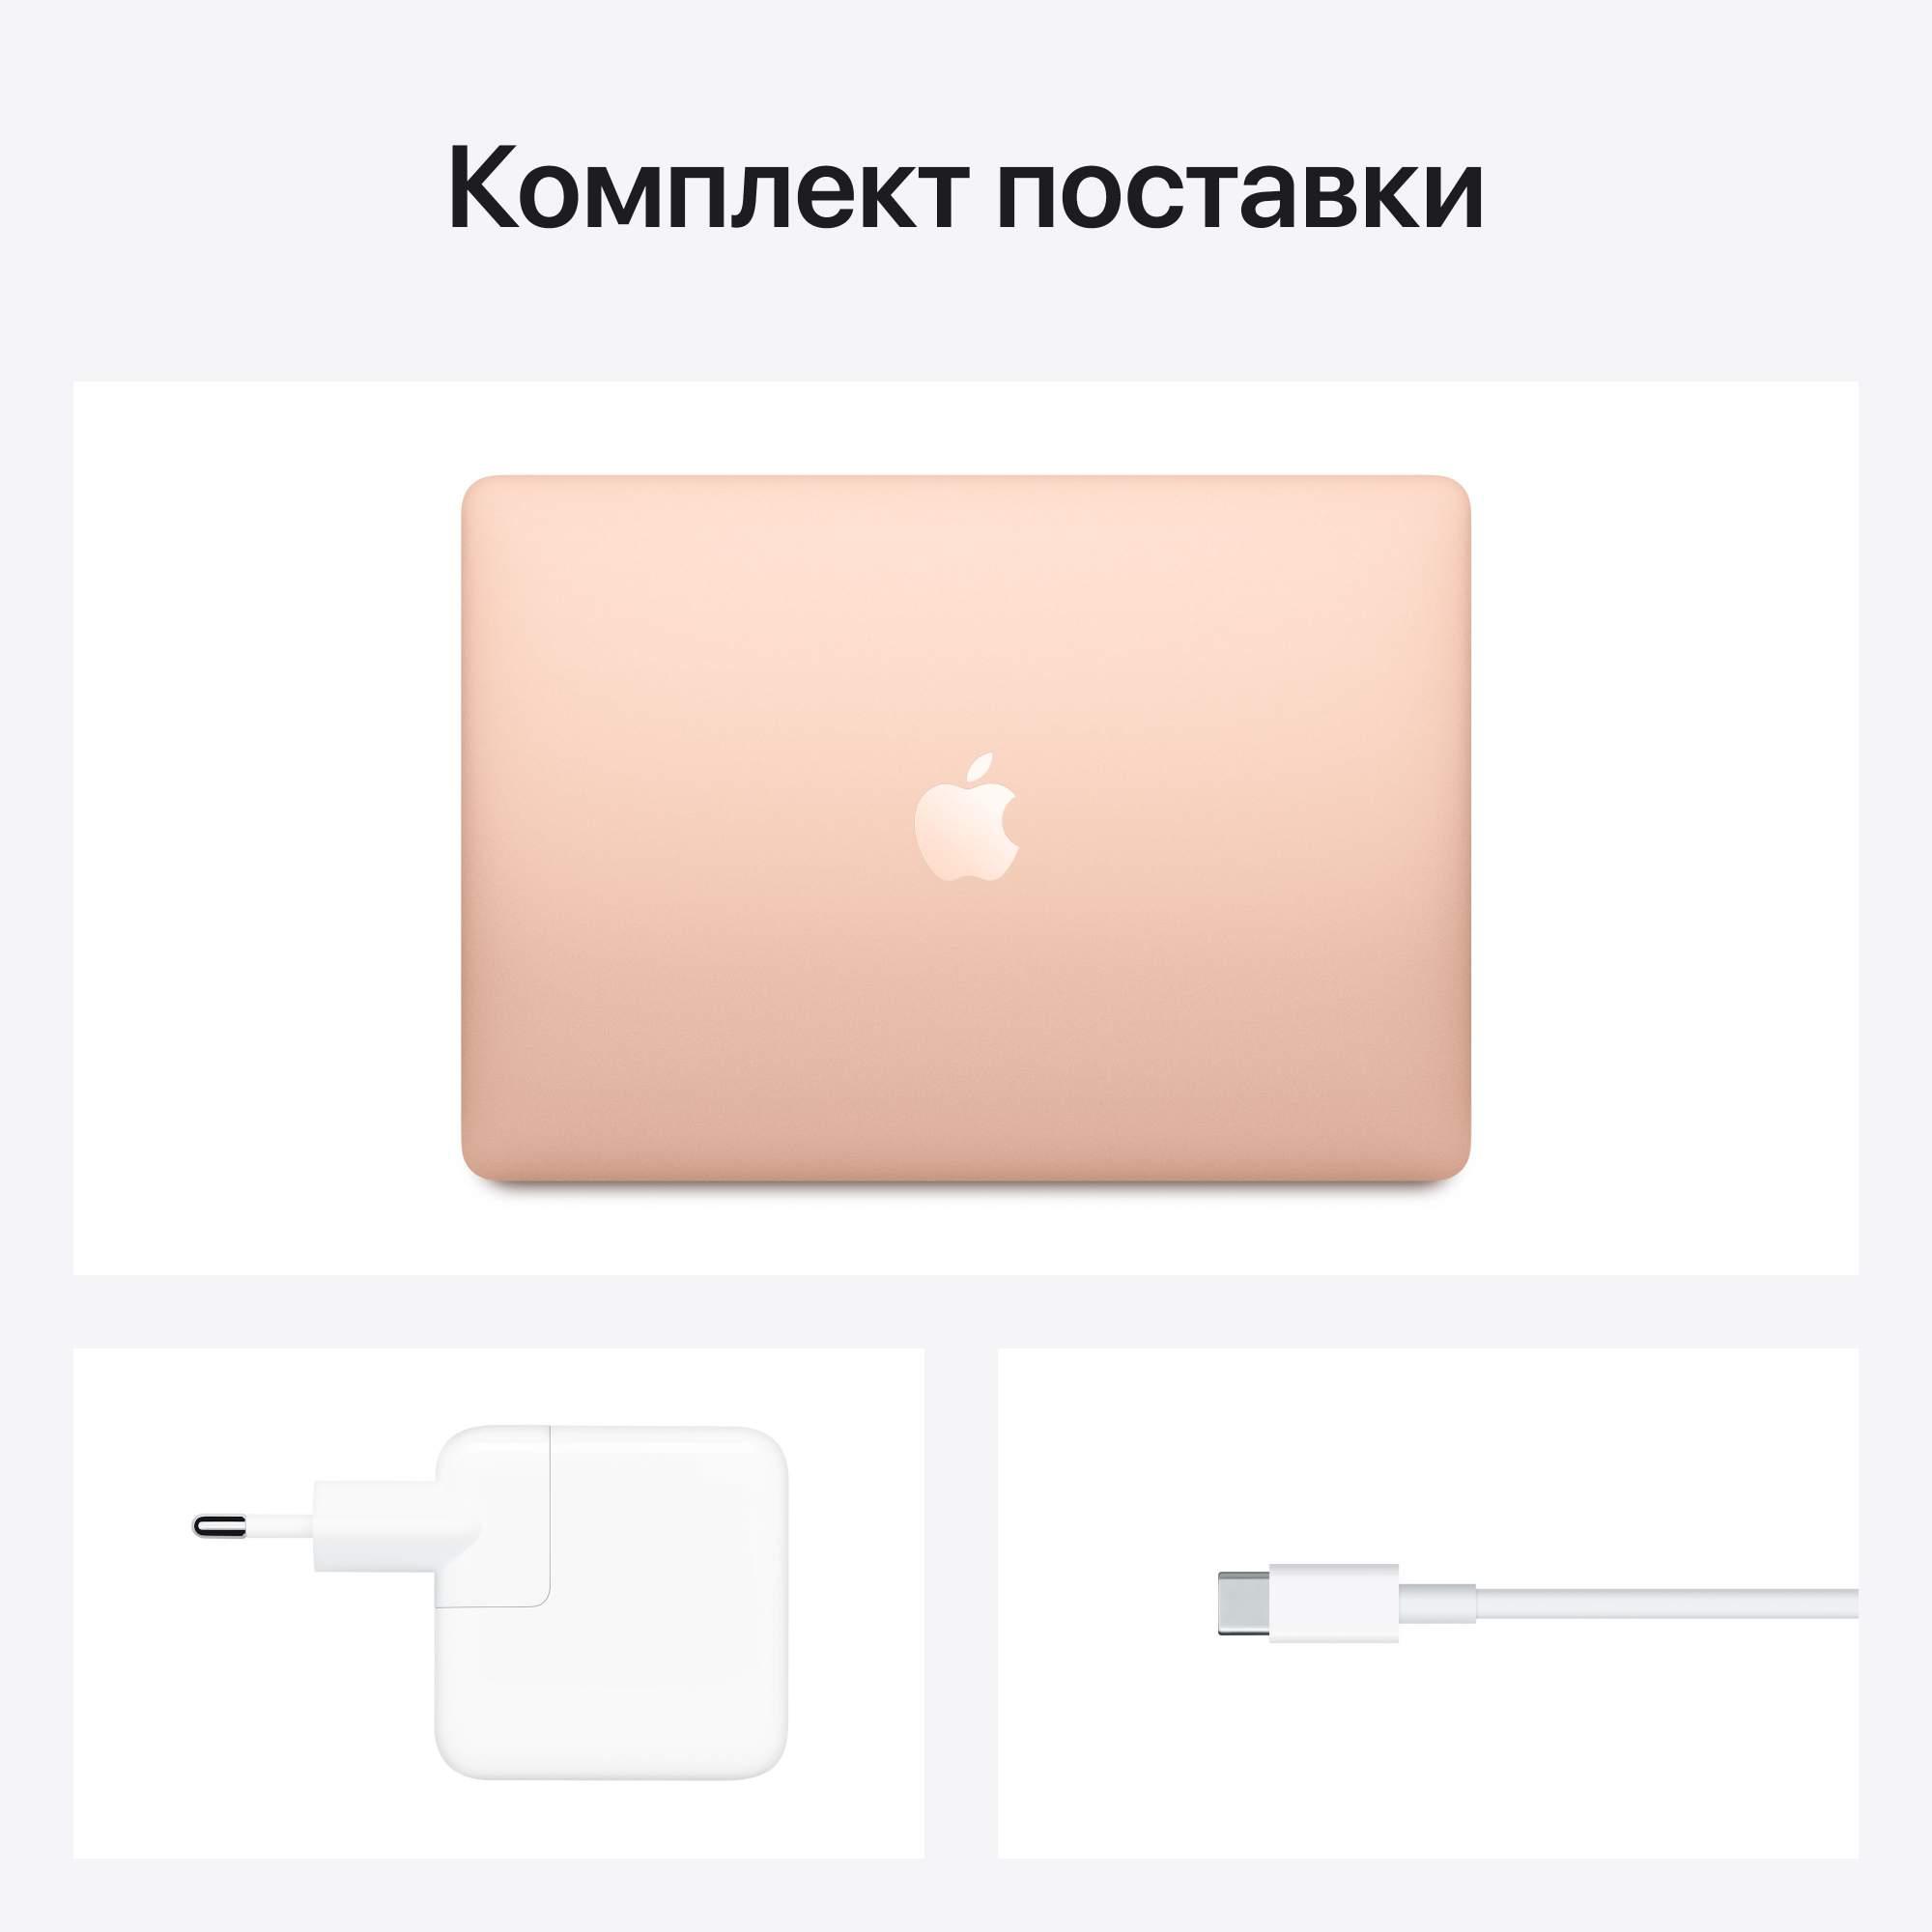 ноутбук Apple MacBook Air 2020 M1/8GB/512GB Gold (MGNE3RU/A)